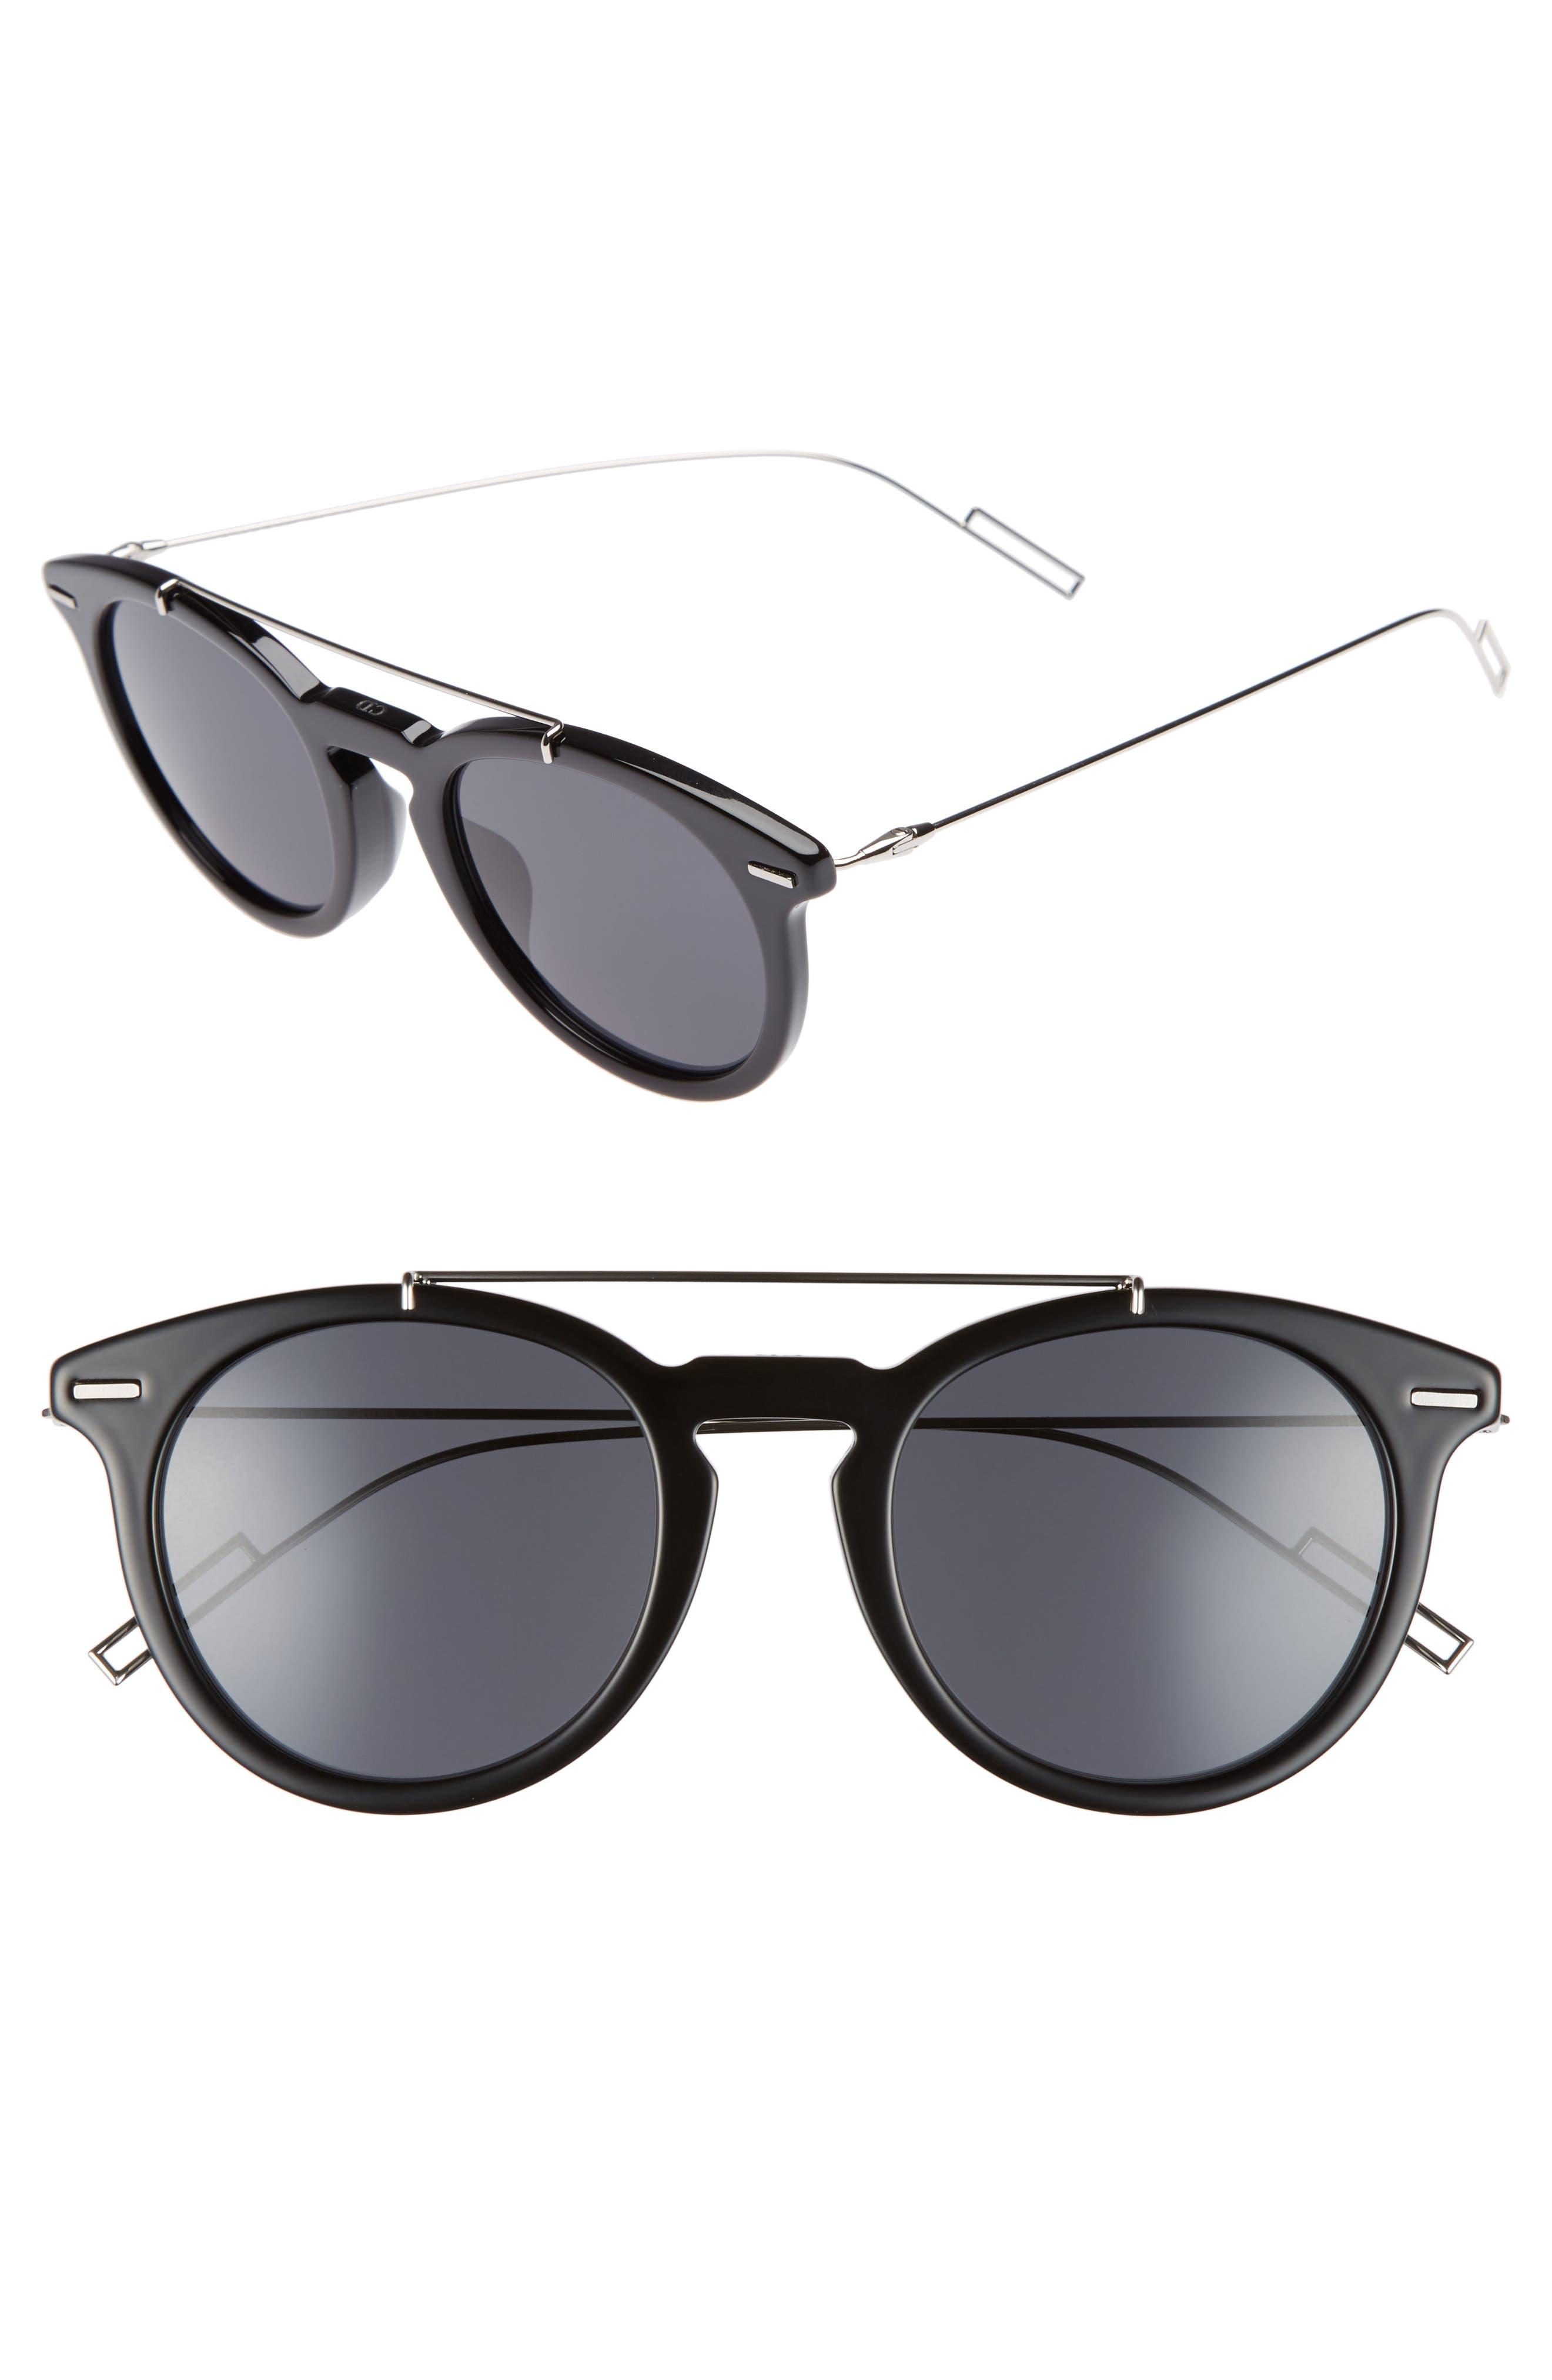 DIOR HOMME Master 51Mm Sunglasses - Black